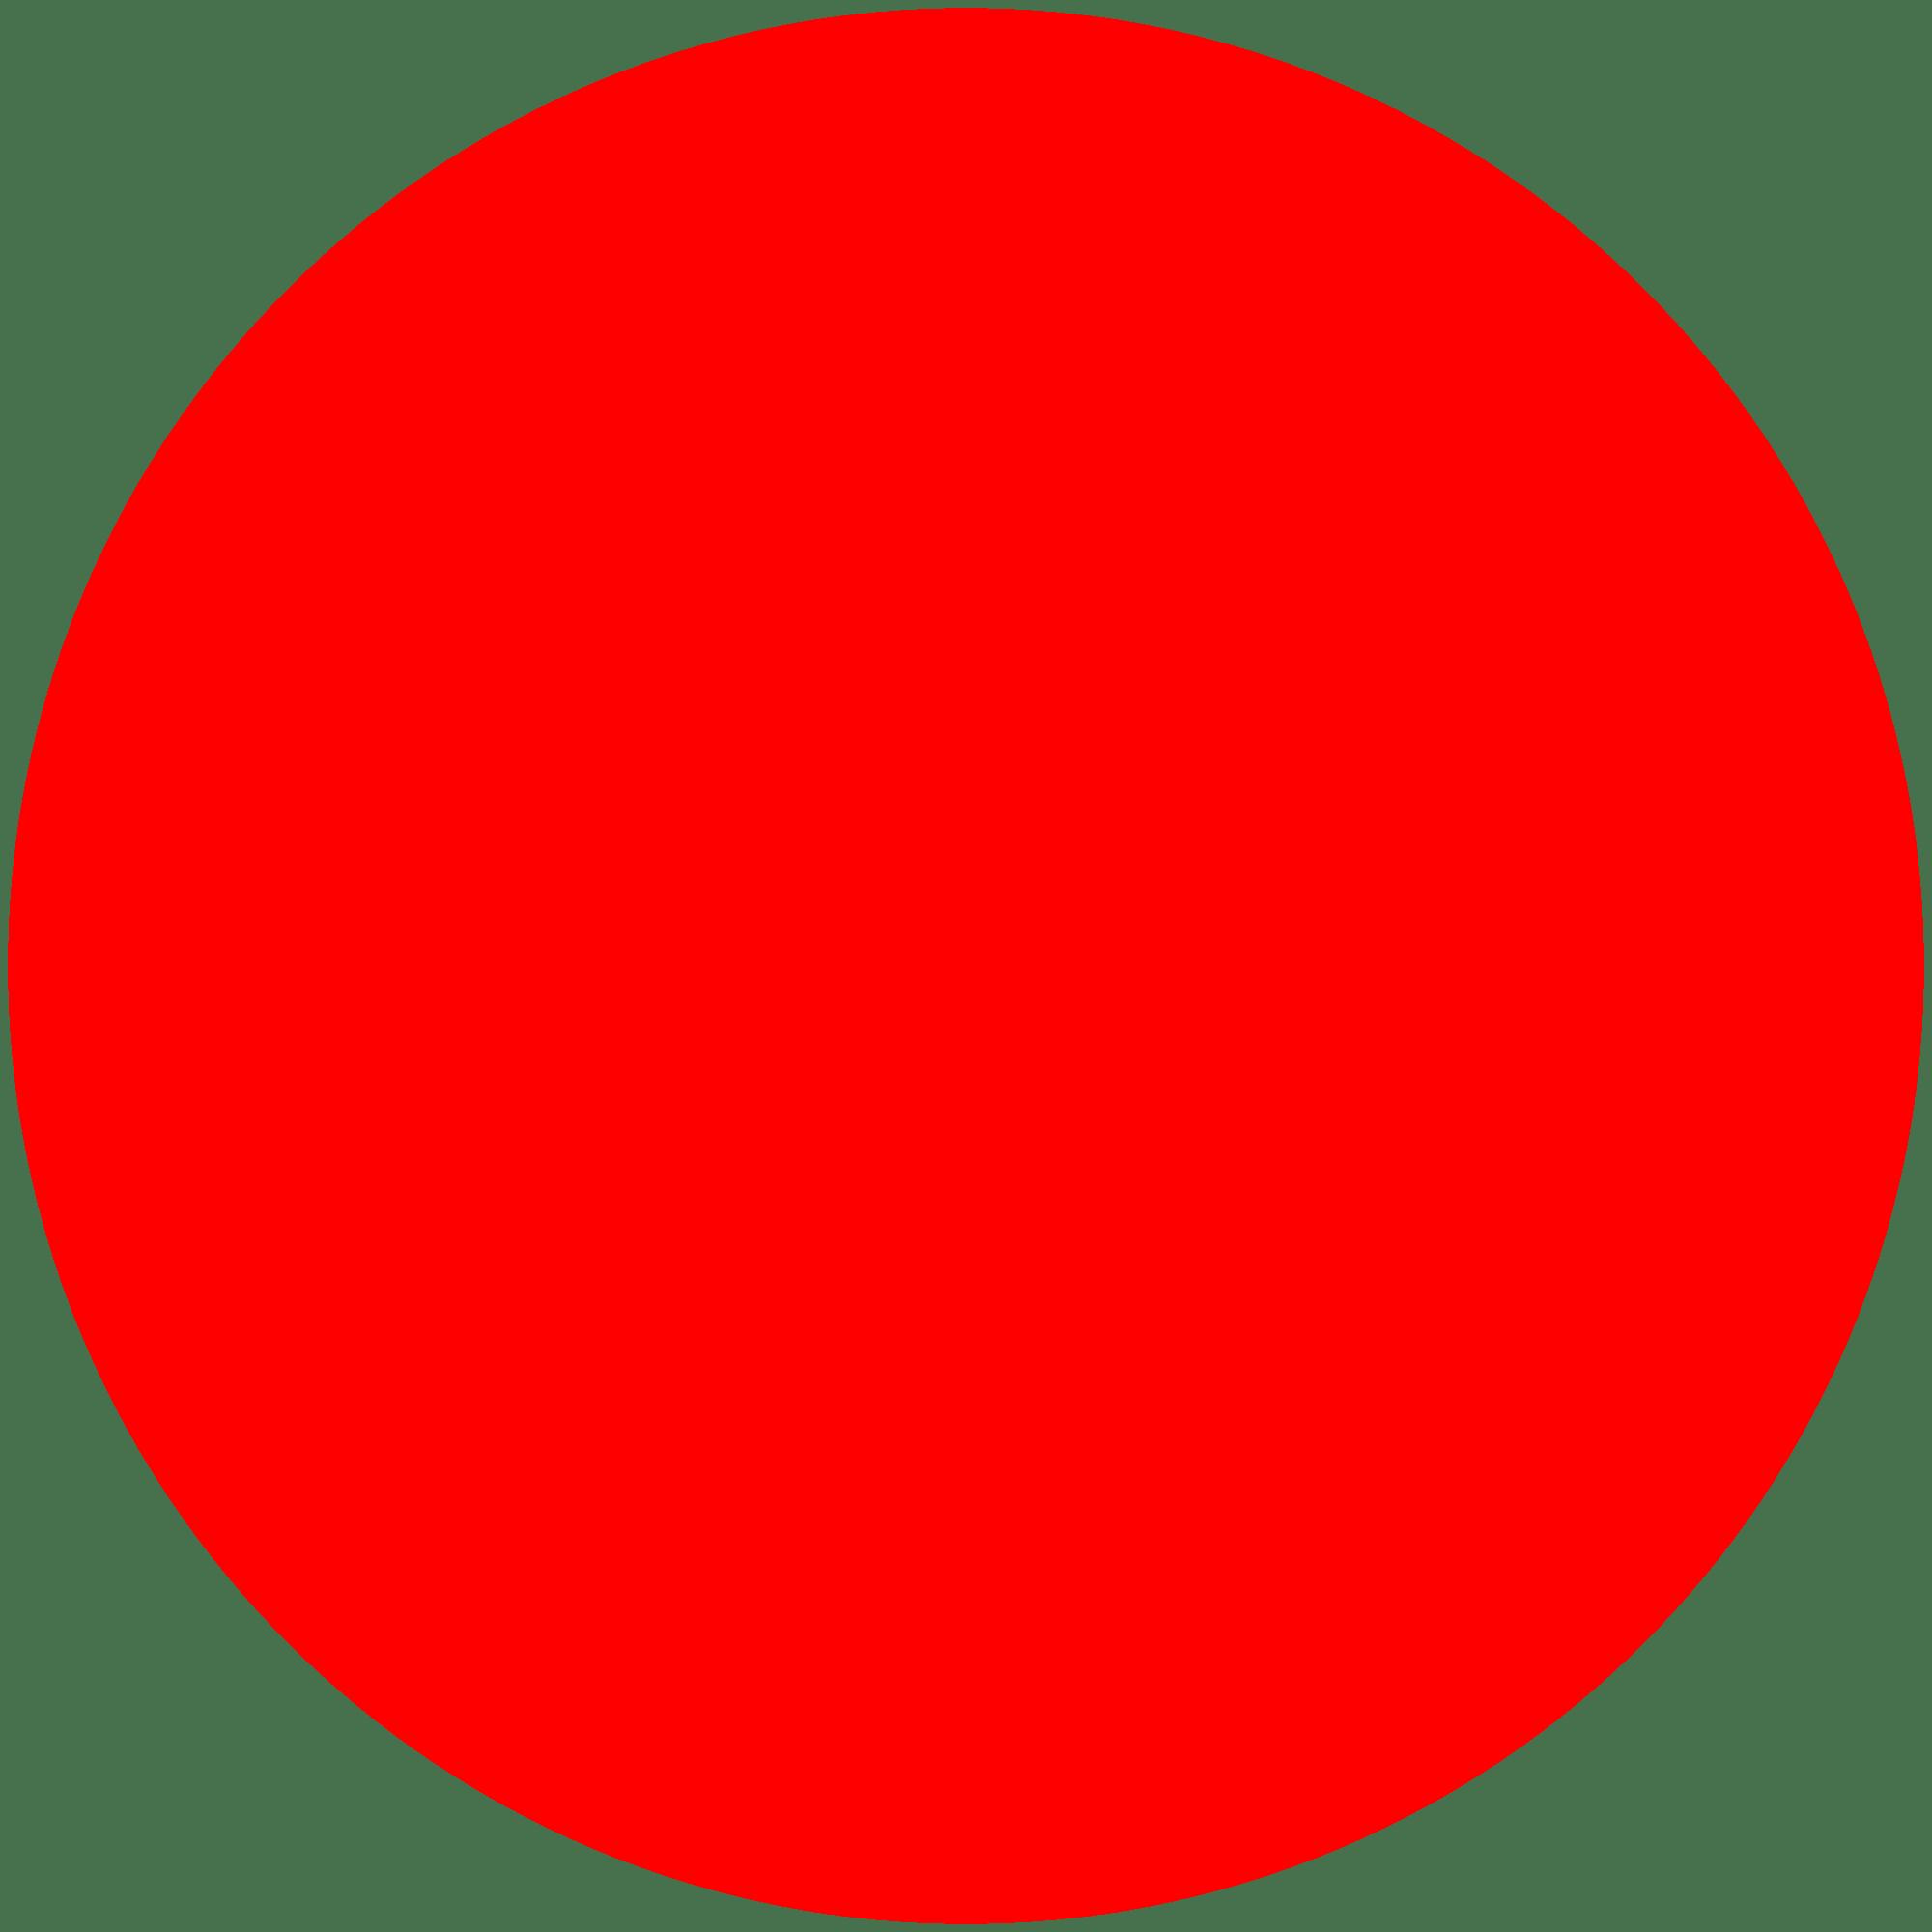 Red Circle transparent PNG.